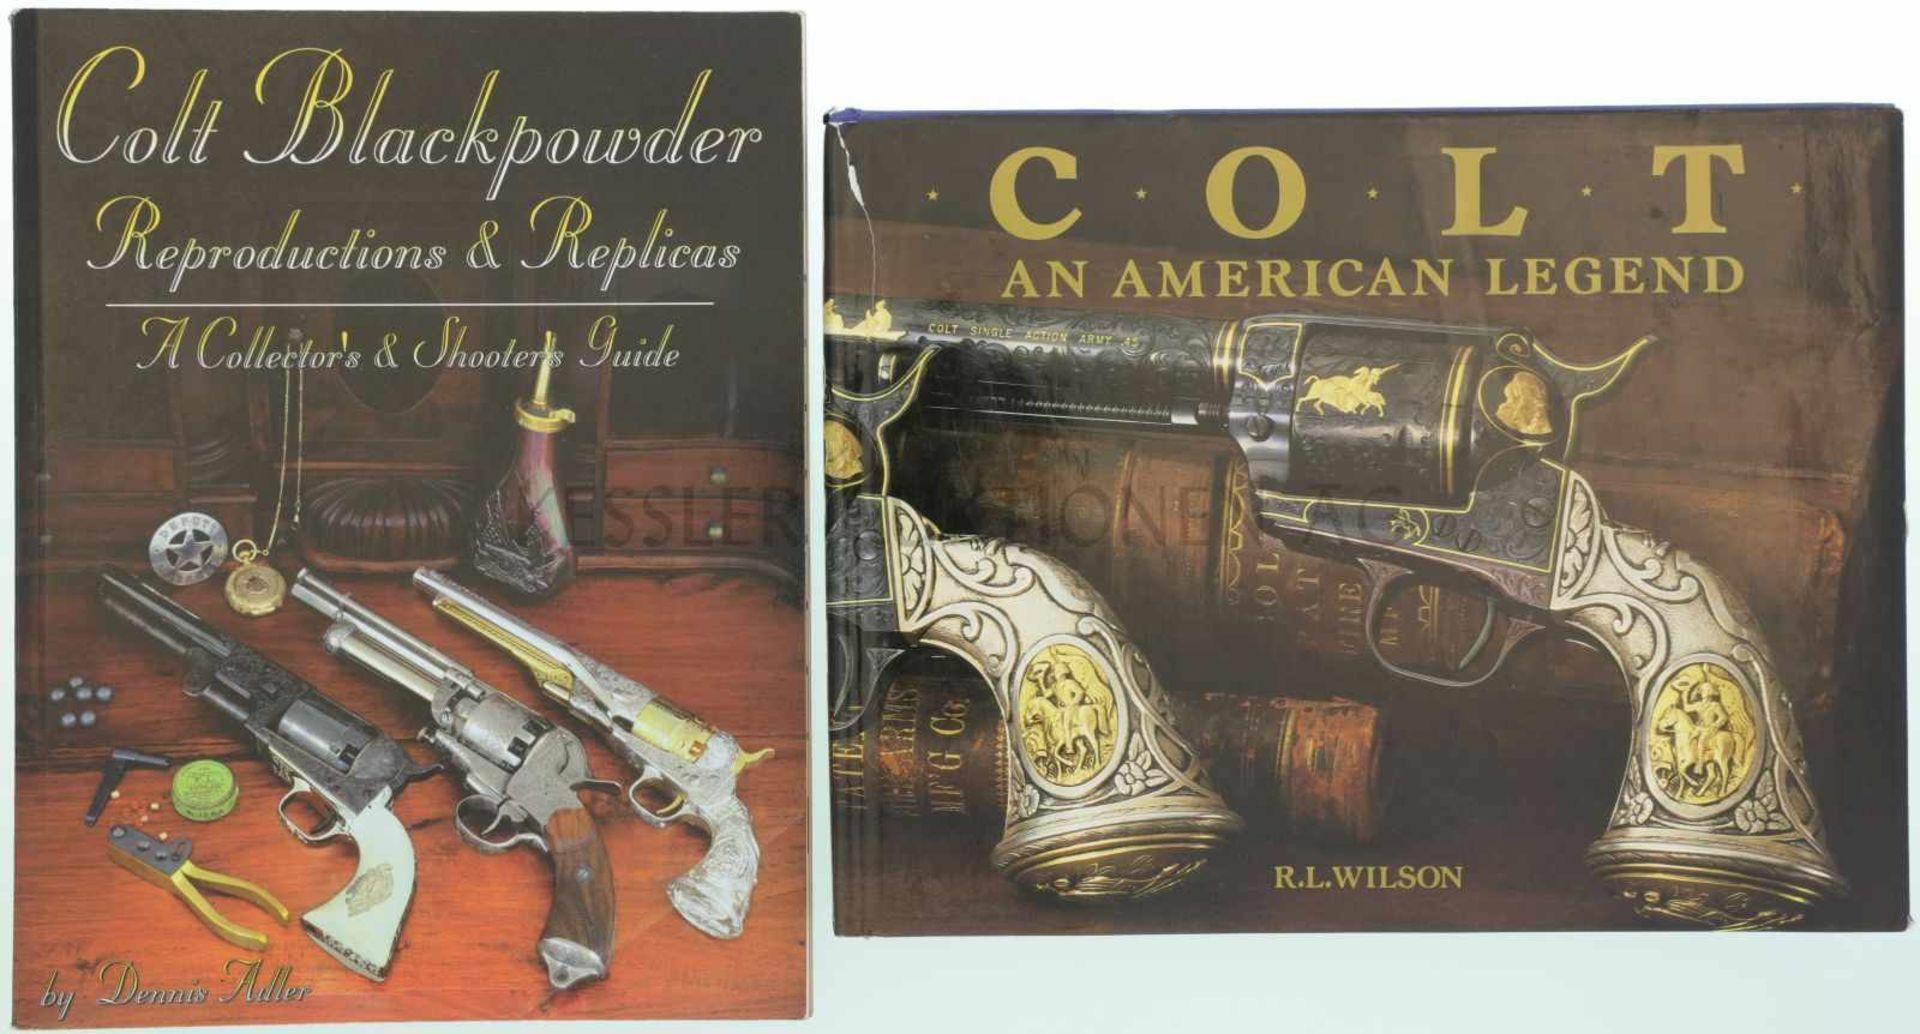 Konvolut von 2 Büchern 1. Colt Blackpowder, Reproductions & Replicas, a collector's & shooters